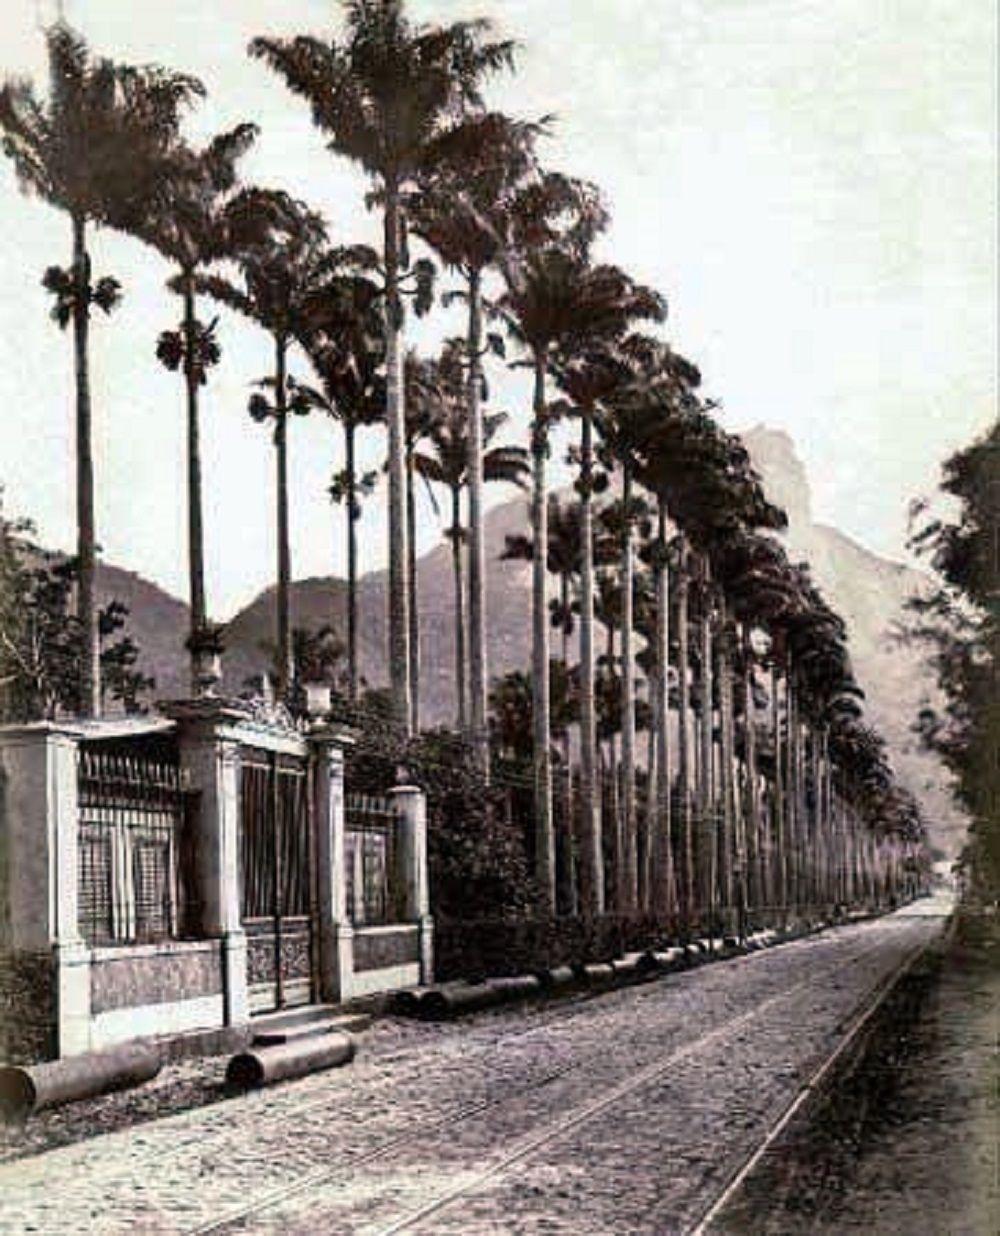 Rua Jardim Botânico. 1894.  https://www.facebook.com/Guarantiga/photos/a.490233921007939.115673.490210317676966/1001904876507505/?type=1&theater